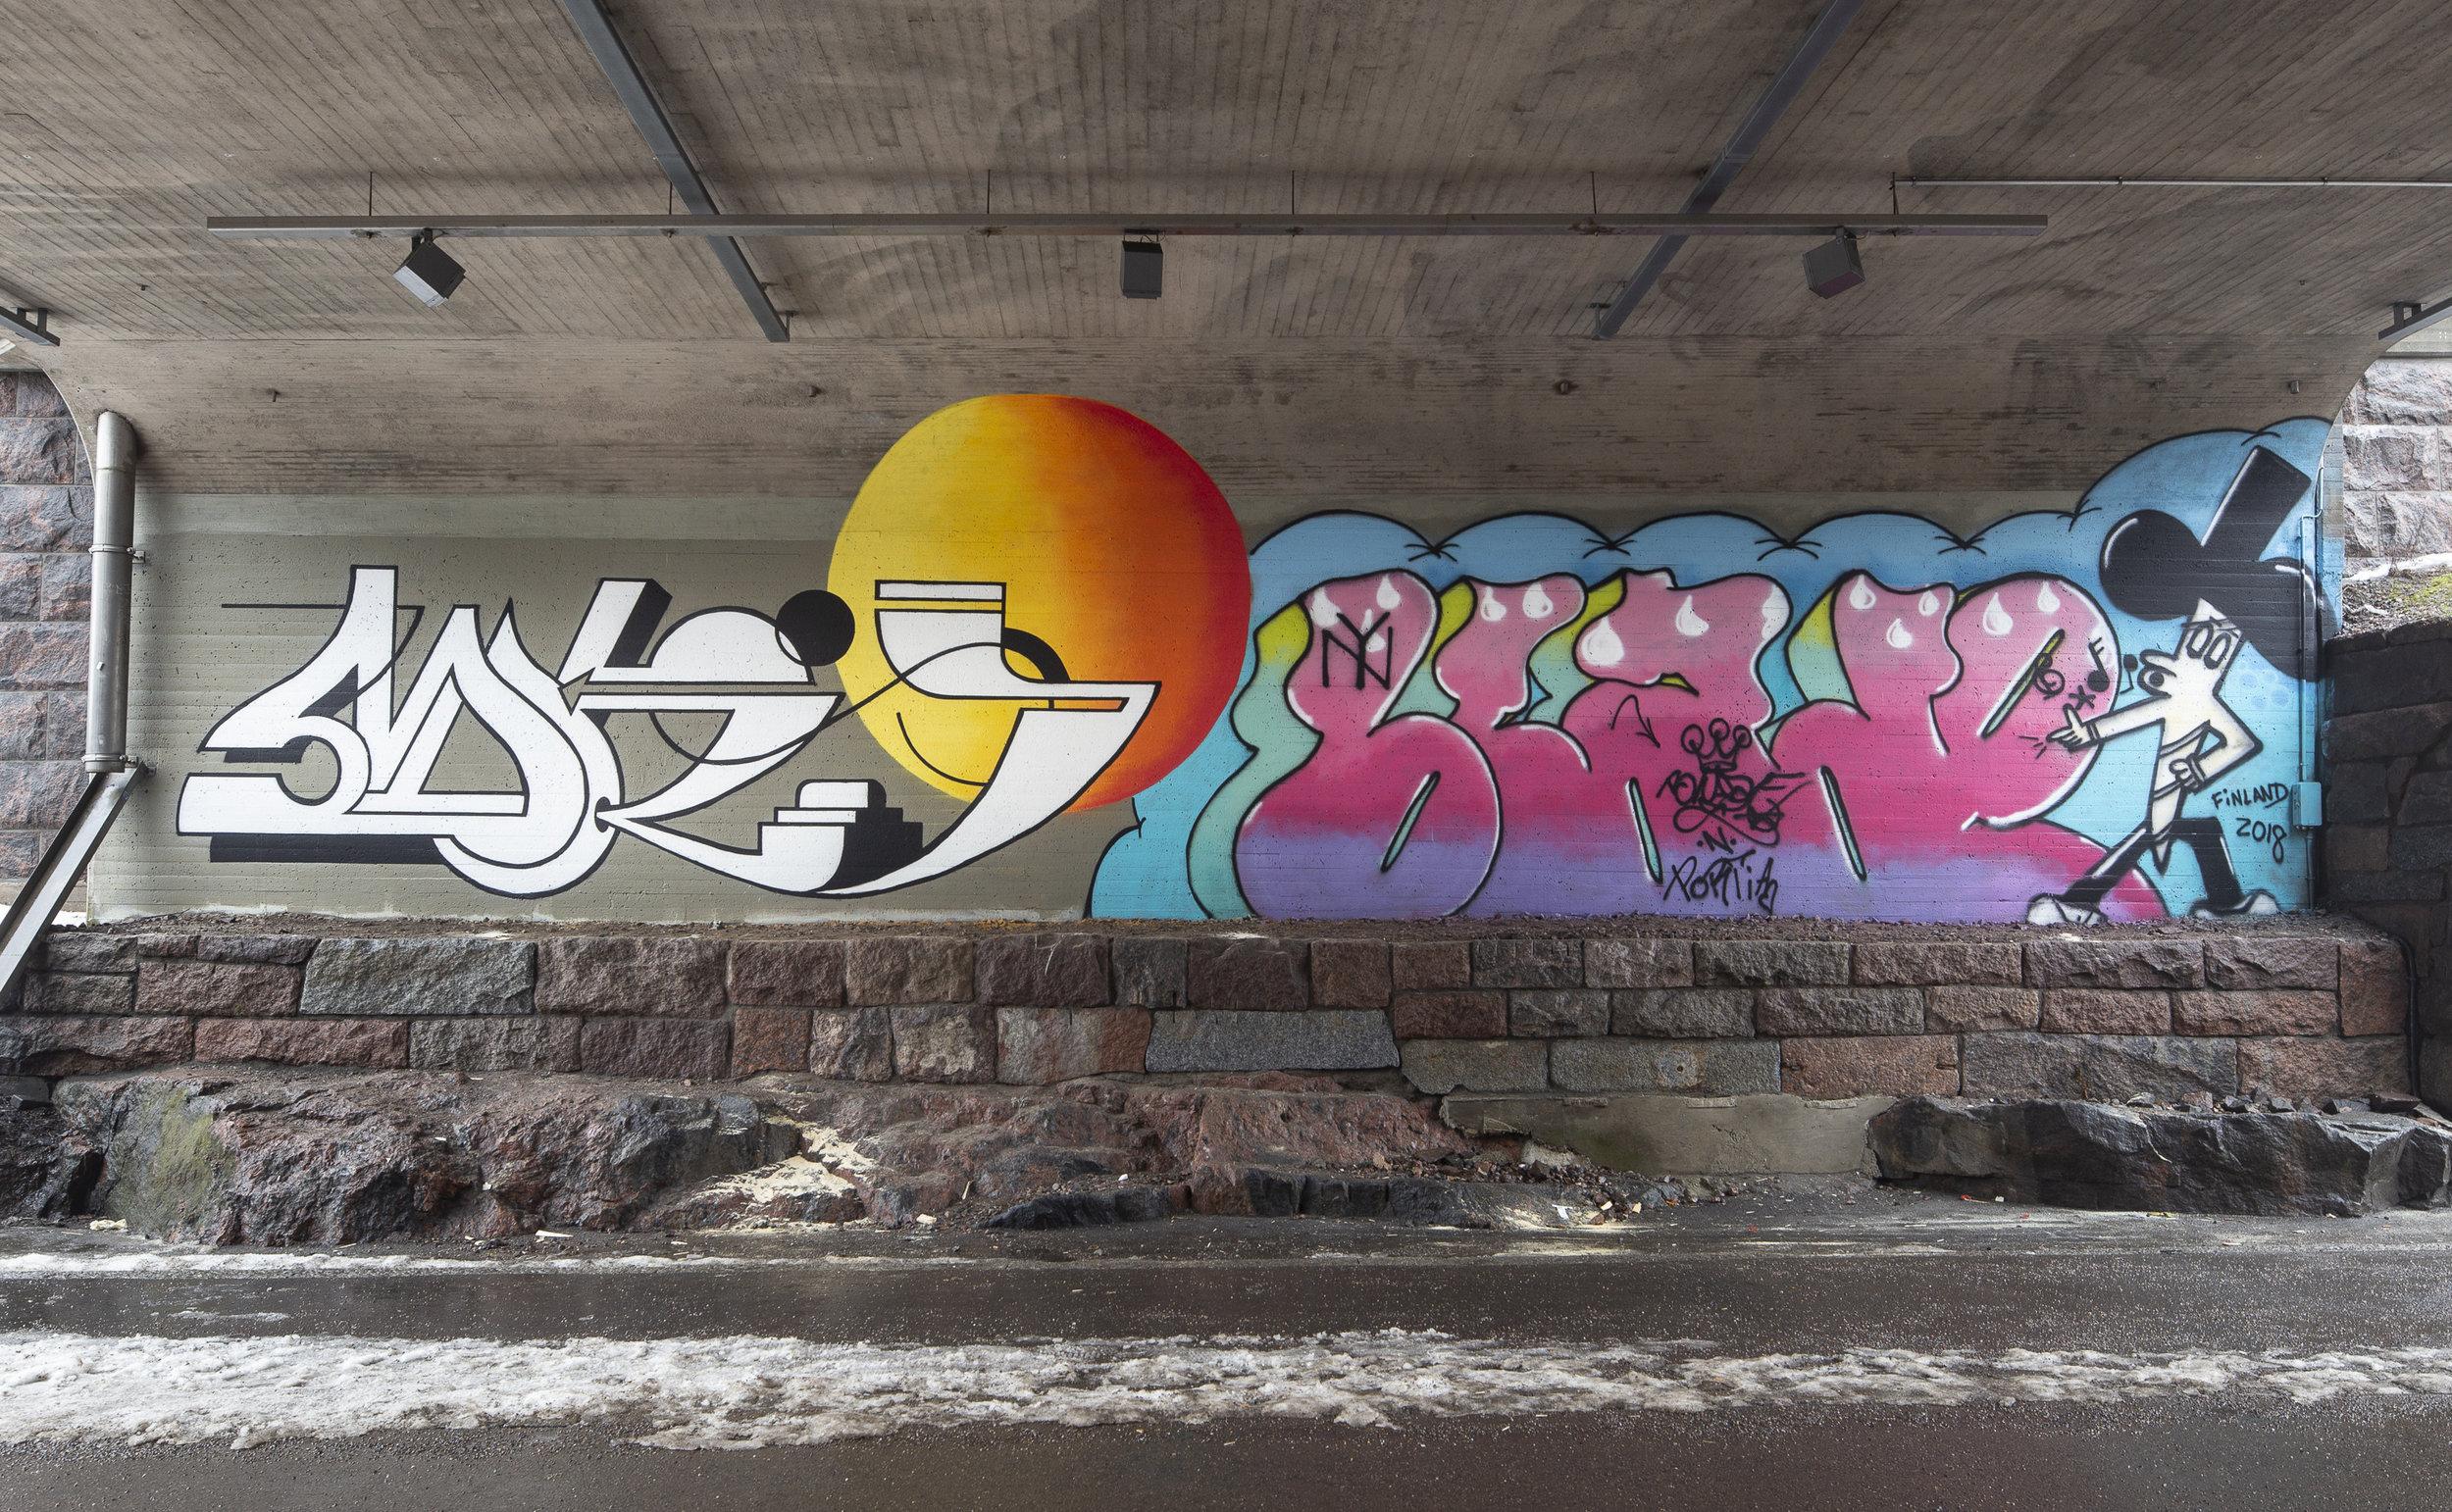 Baana bicycle track, Helsinki. April 2018  Blade and Mick La Rock  for @ HAM Helsinki,